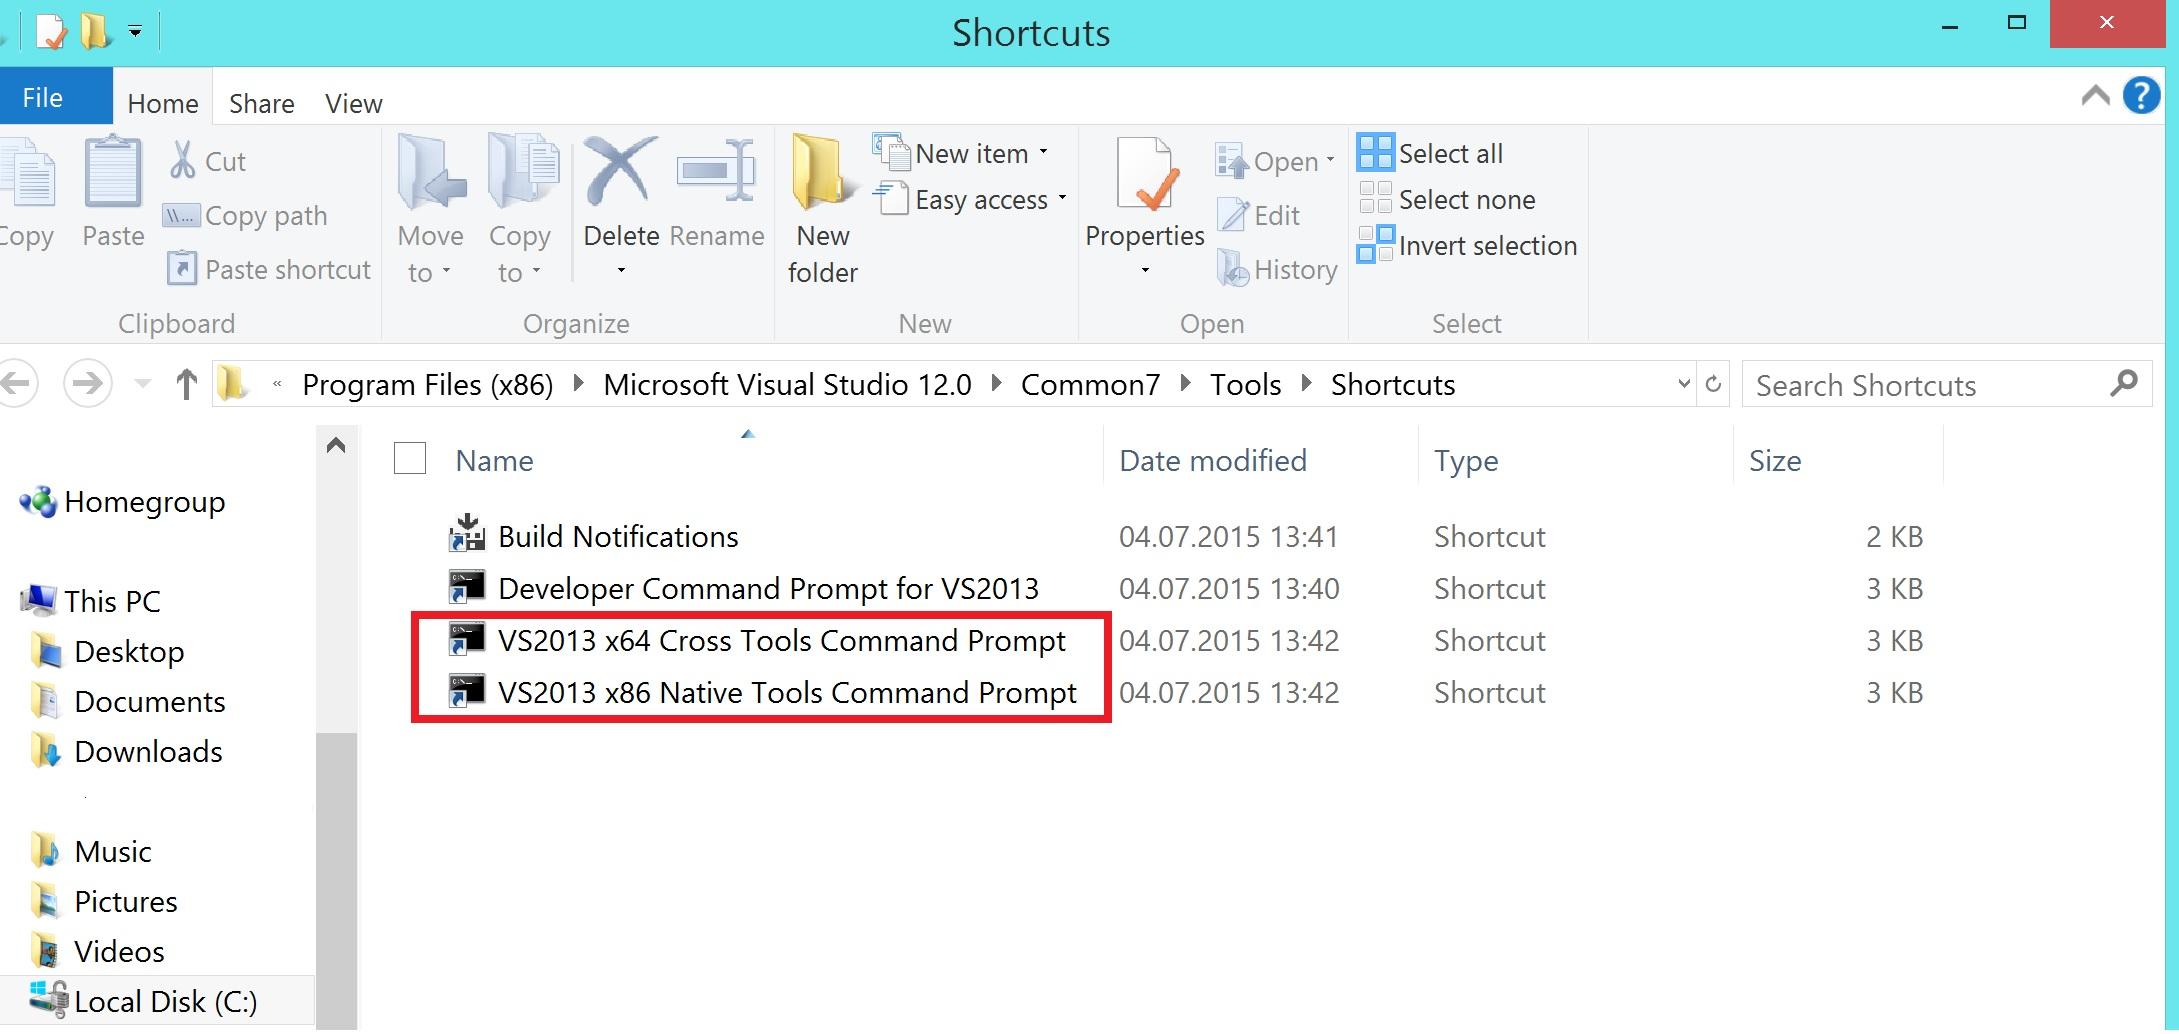 VisualStudioCMDShortcuts